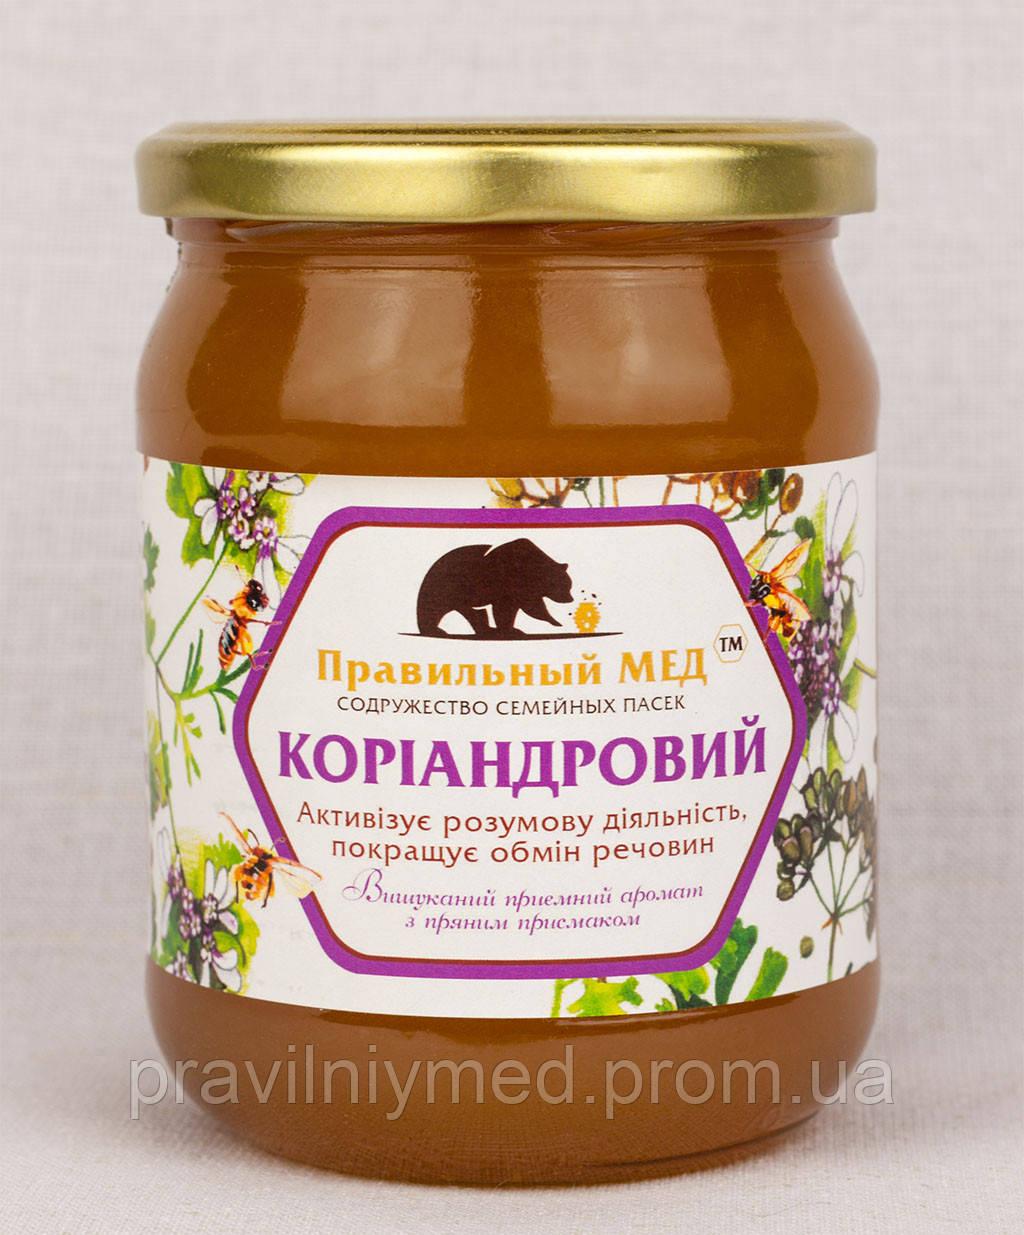 Мёд Кориандровый. Монофлорный Мёд из Кориандра